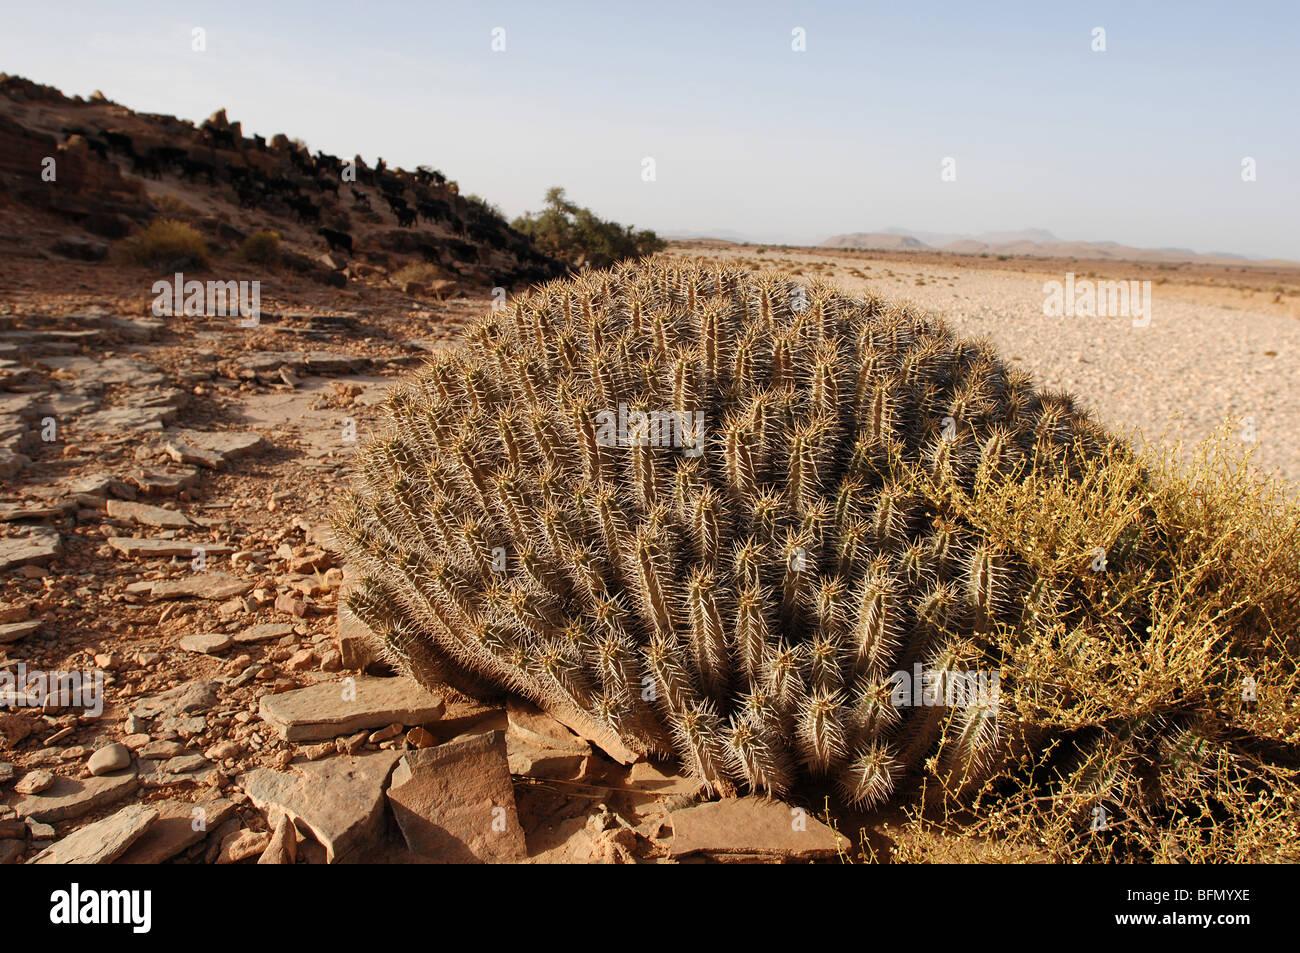 Desert plants pictures